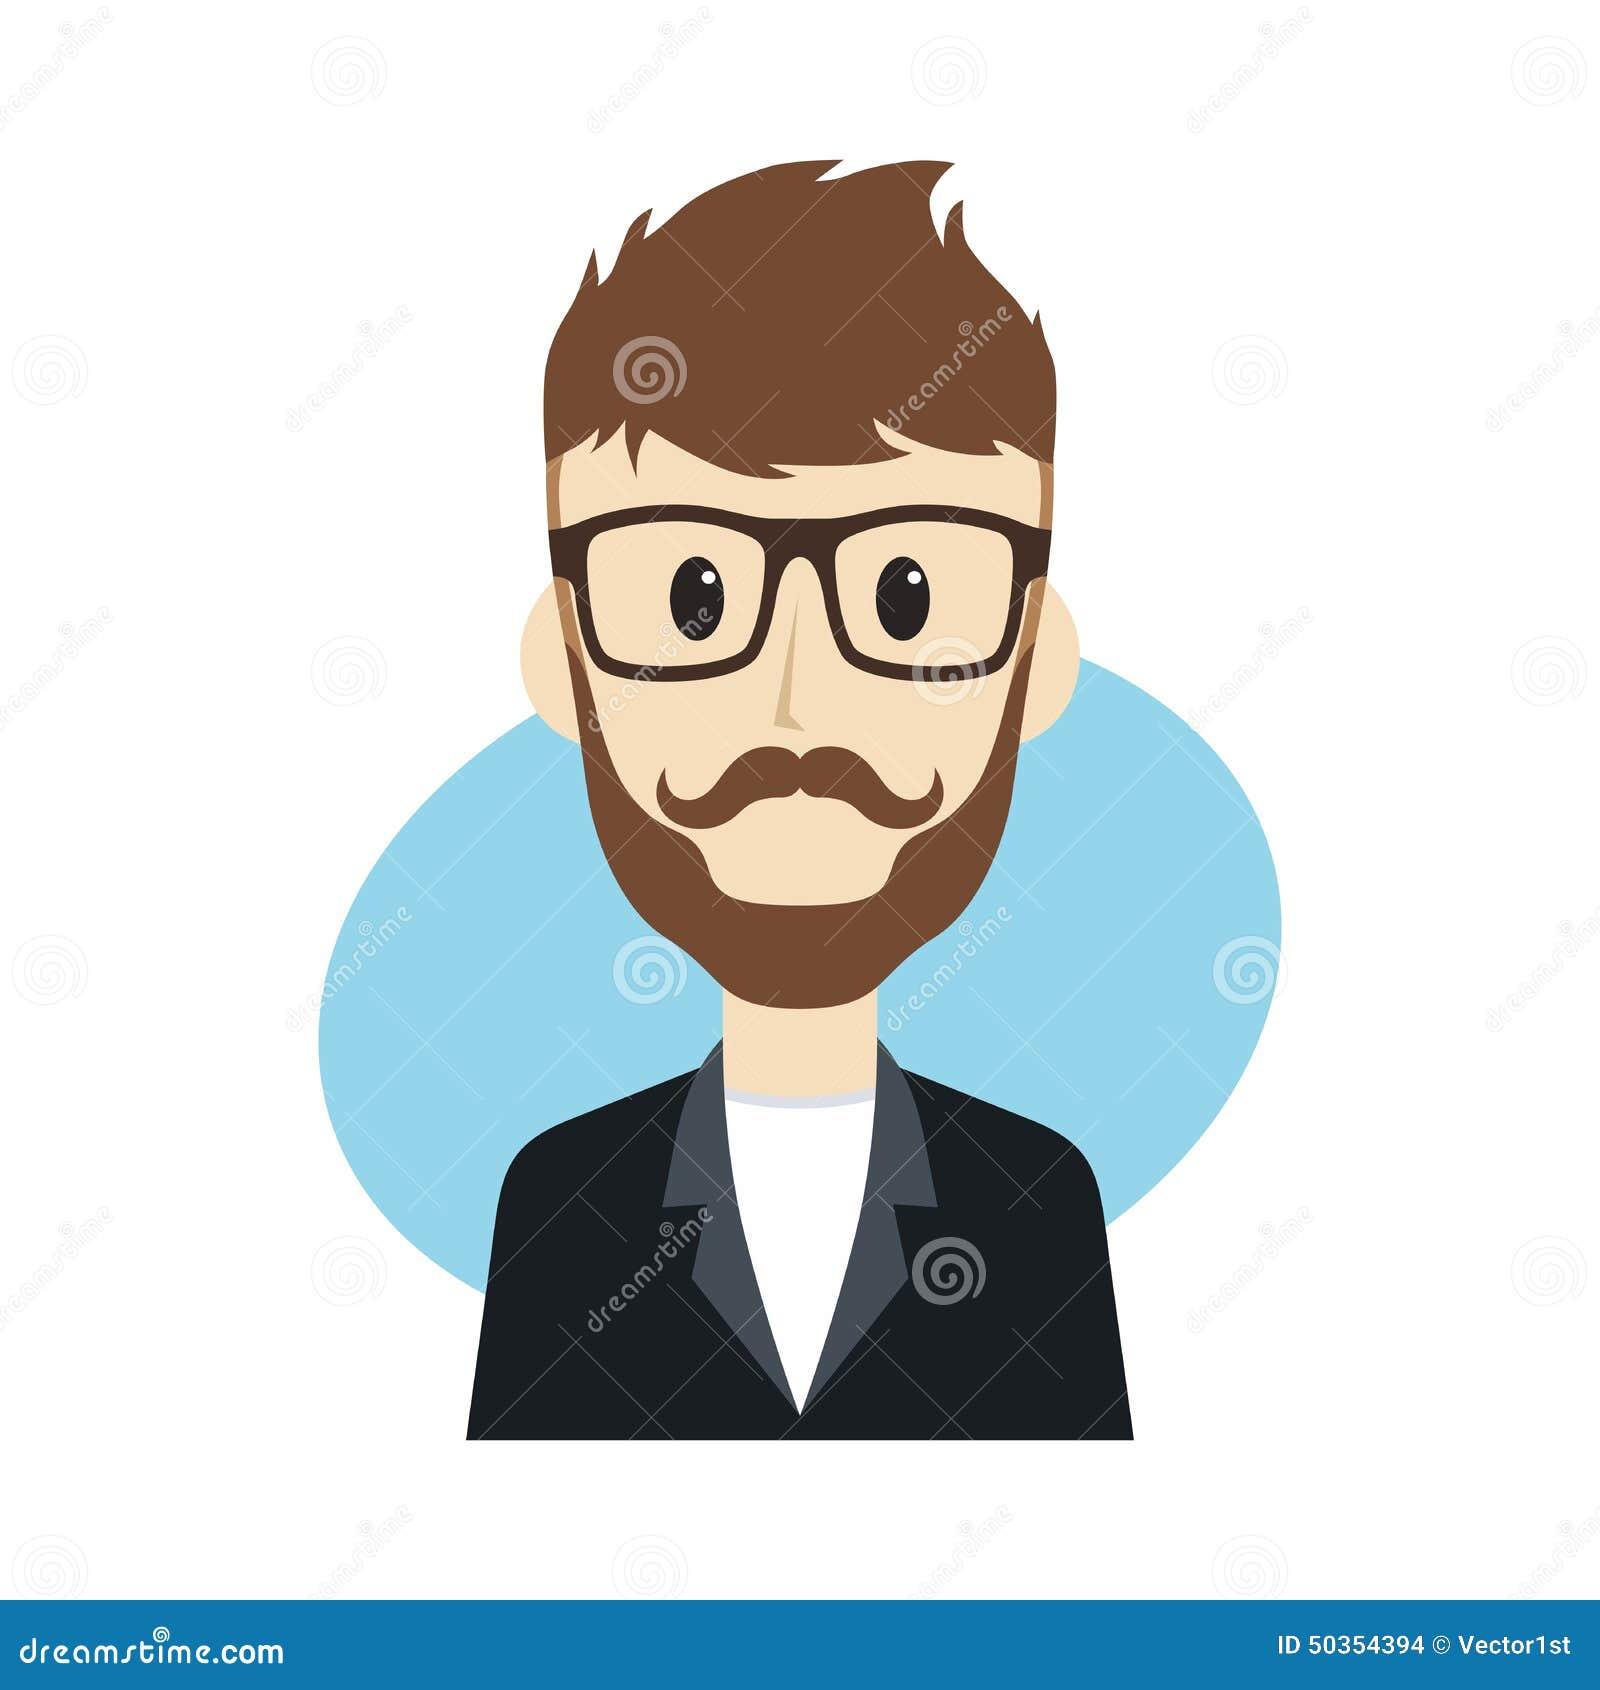 personnage de dessin anim d 39 homme illustration de vecteur illustration du visage noir 50354394. Black Bedroom Furniture Sets. Home Design Ideas